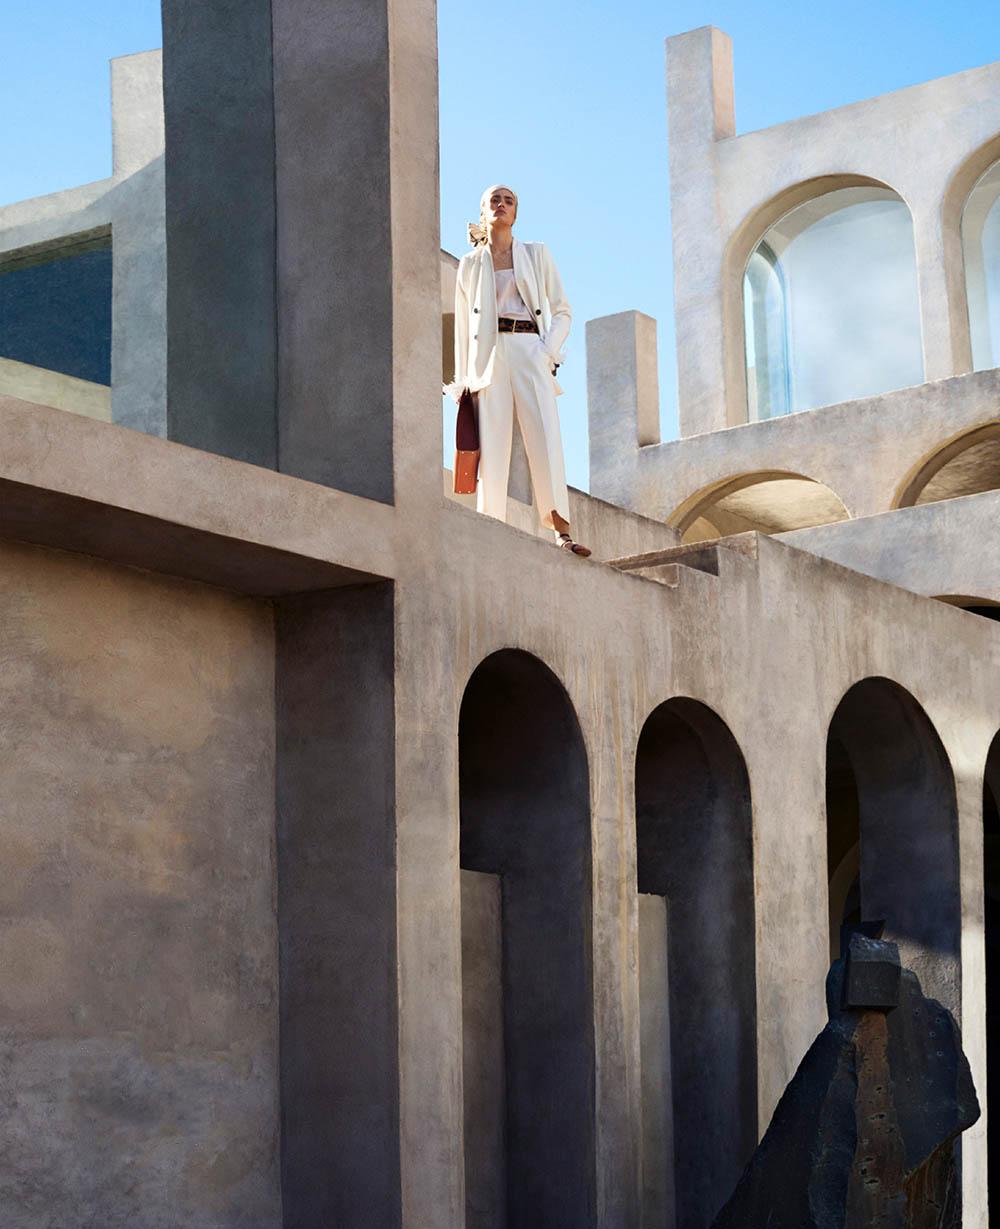 Alexandra Micu by Txema Yeste for Harper's Bazaar US November 2019